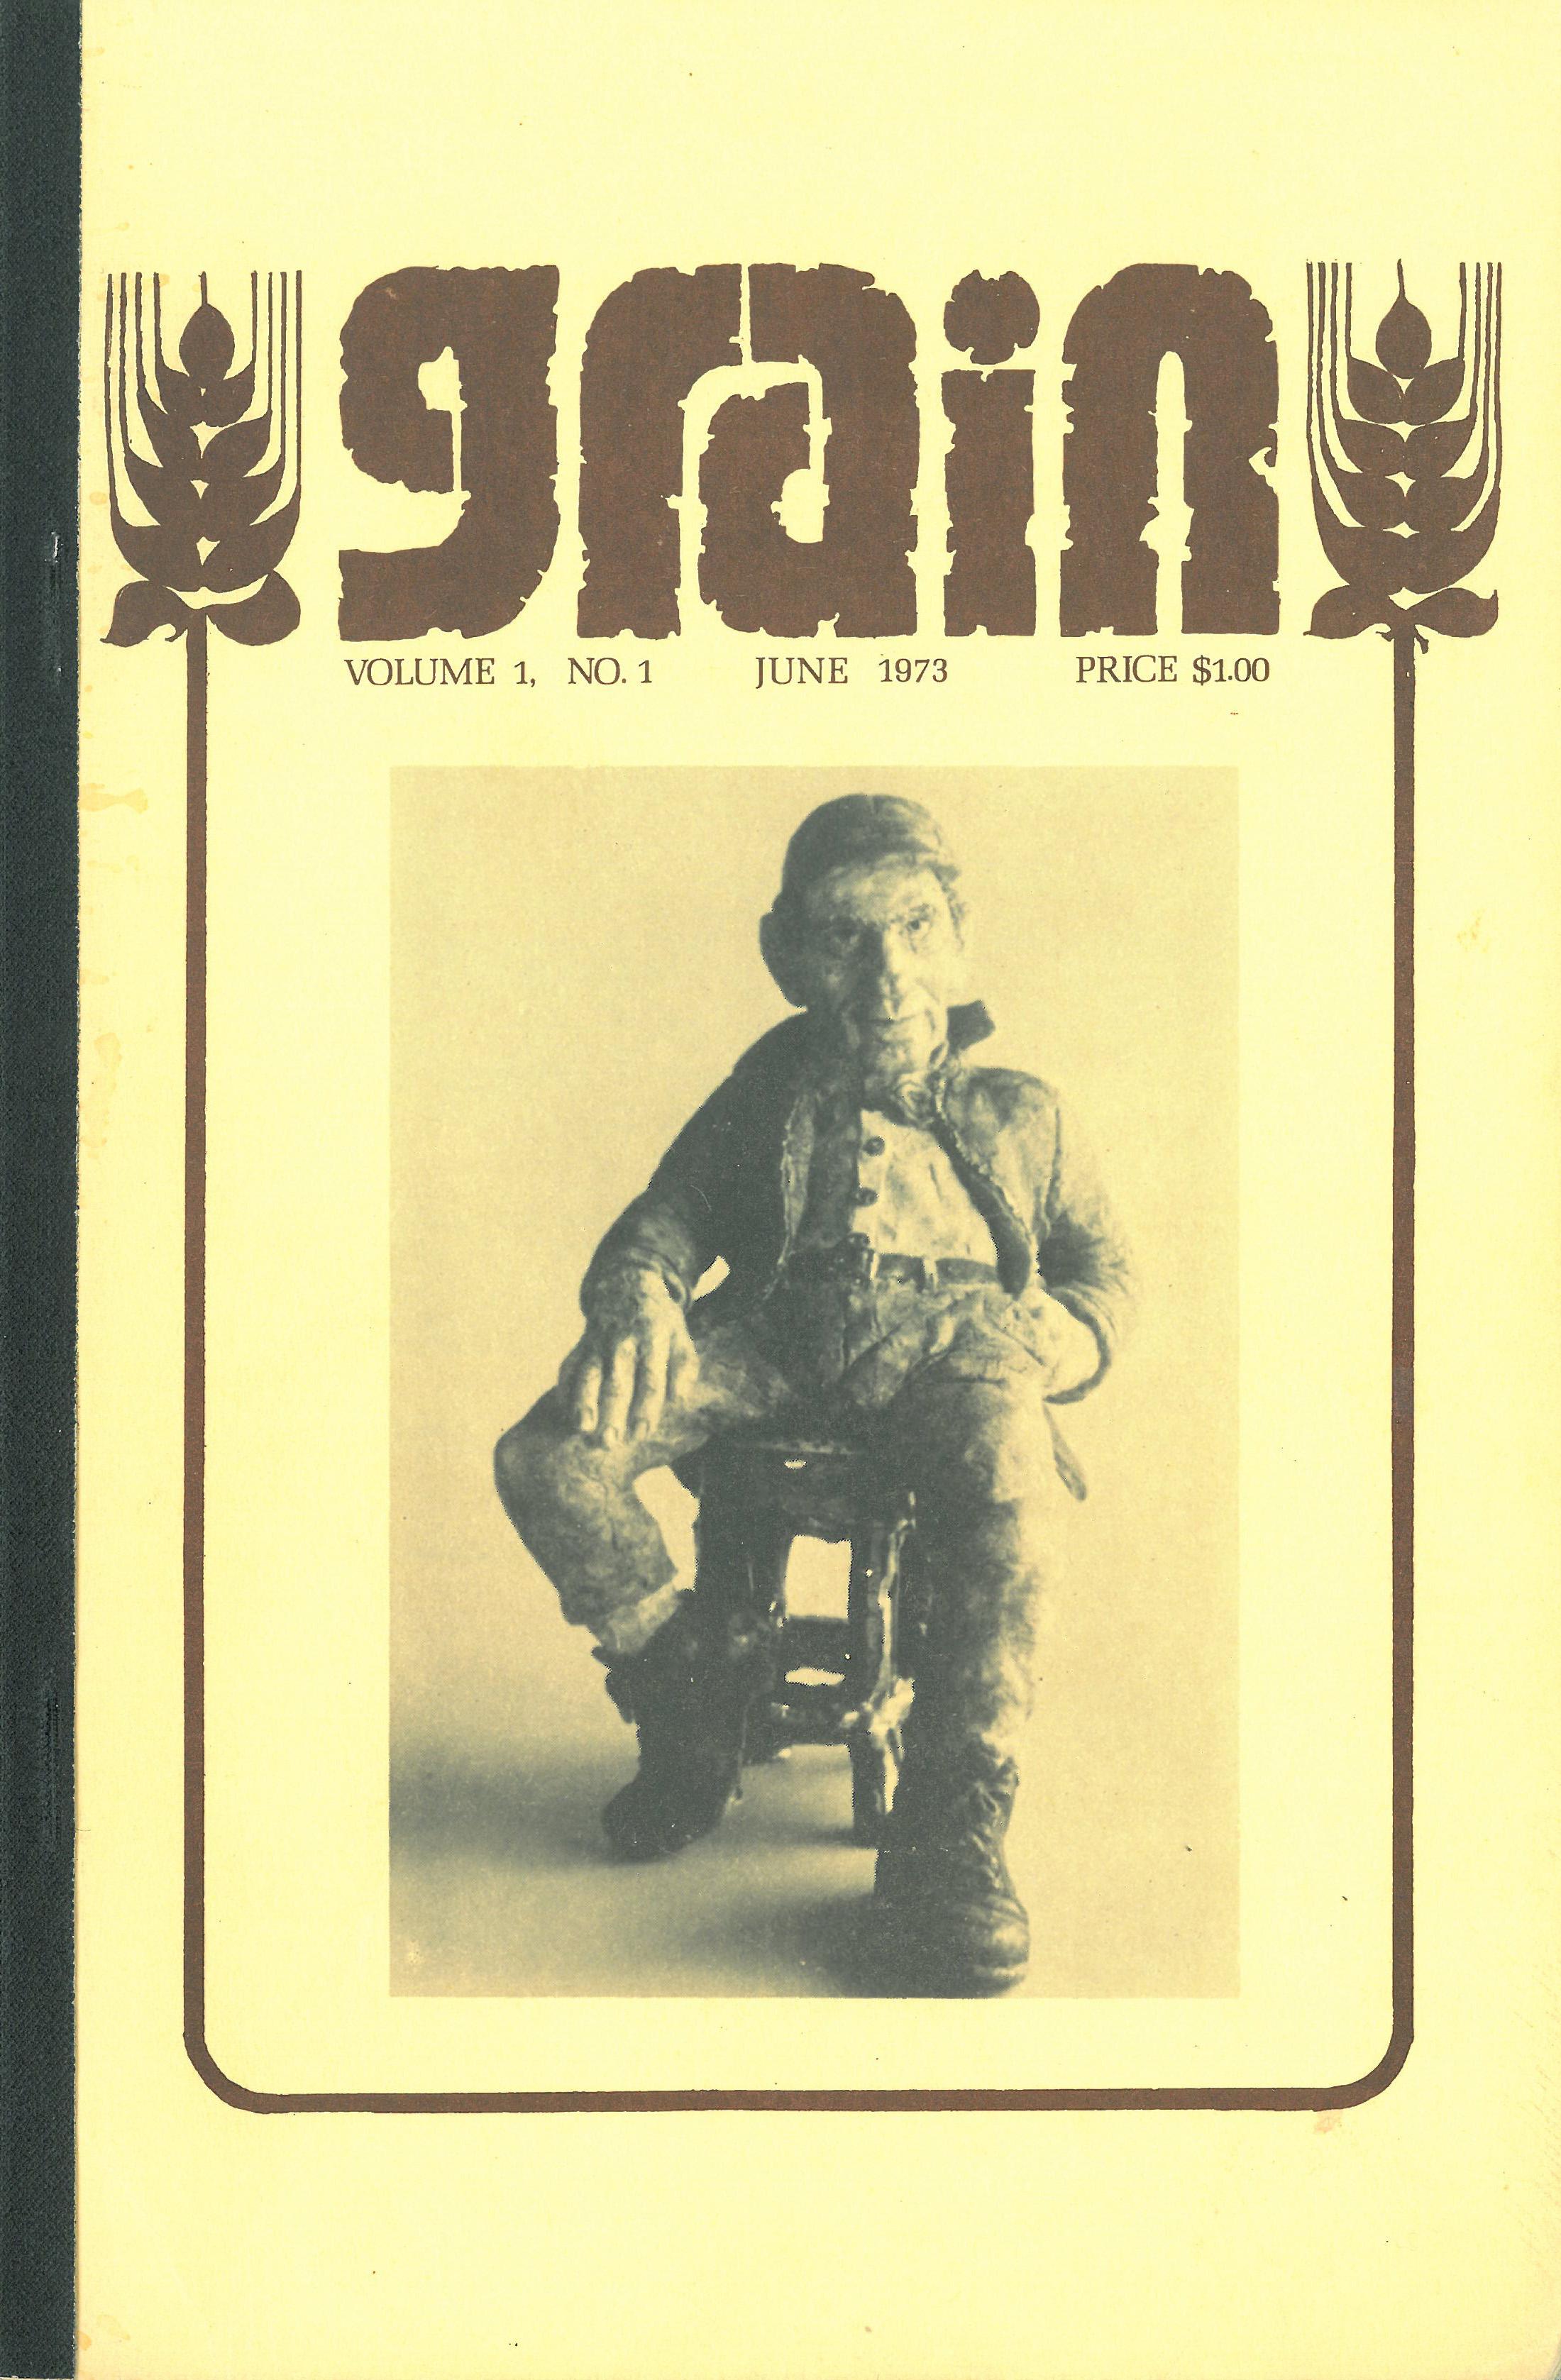 1.1 June 1973